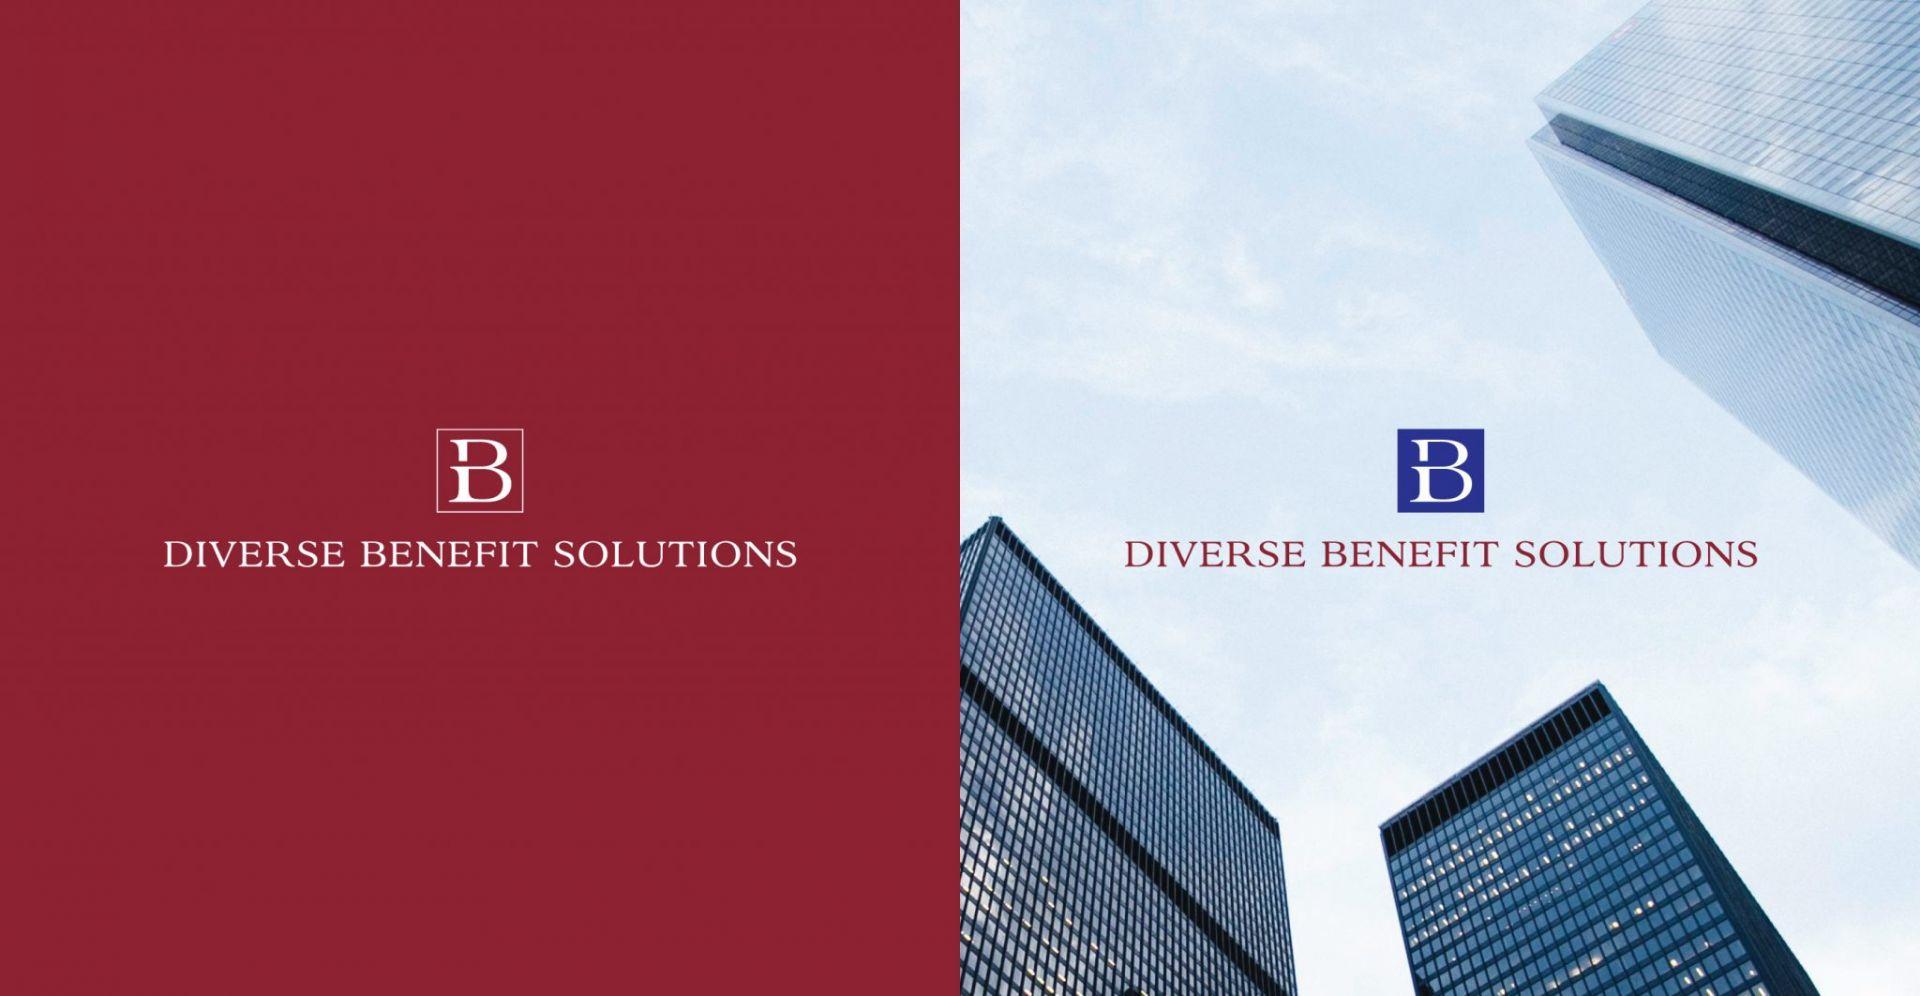 DBS Alternate Logos